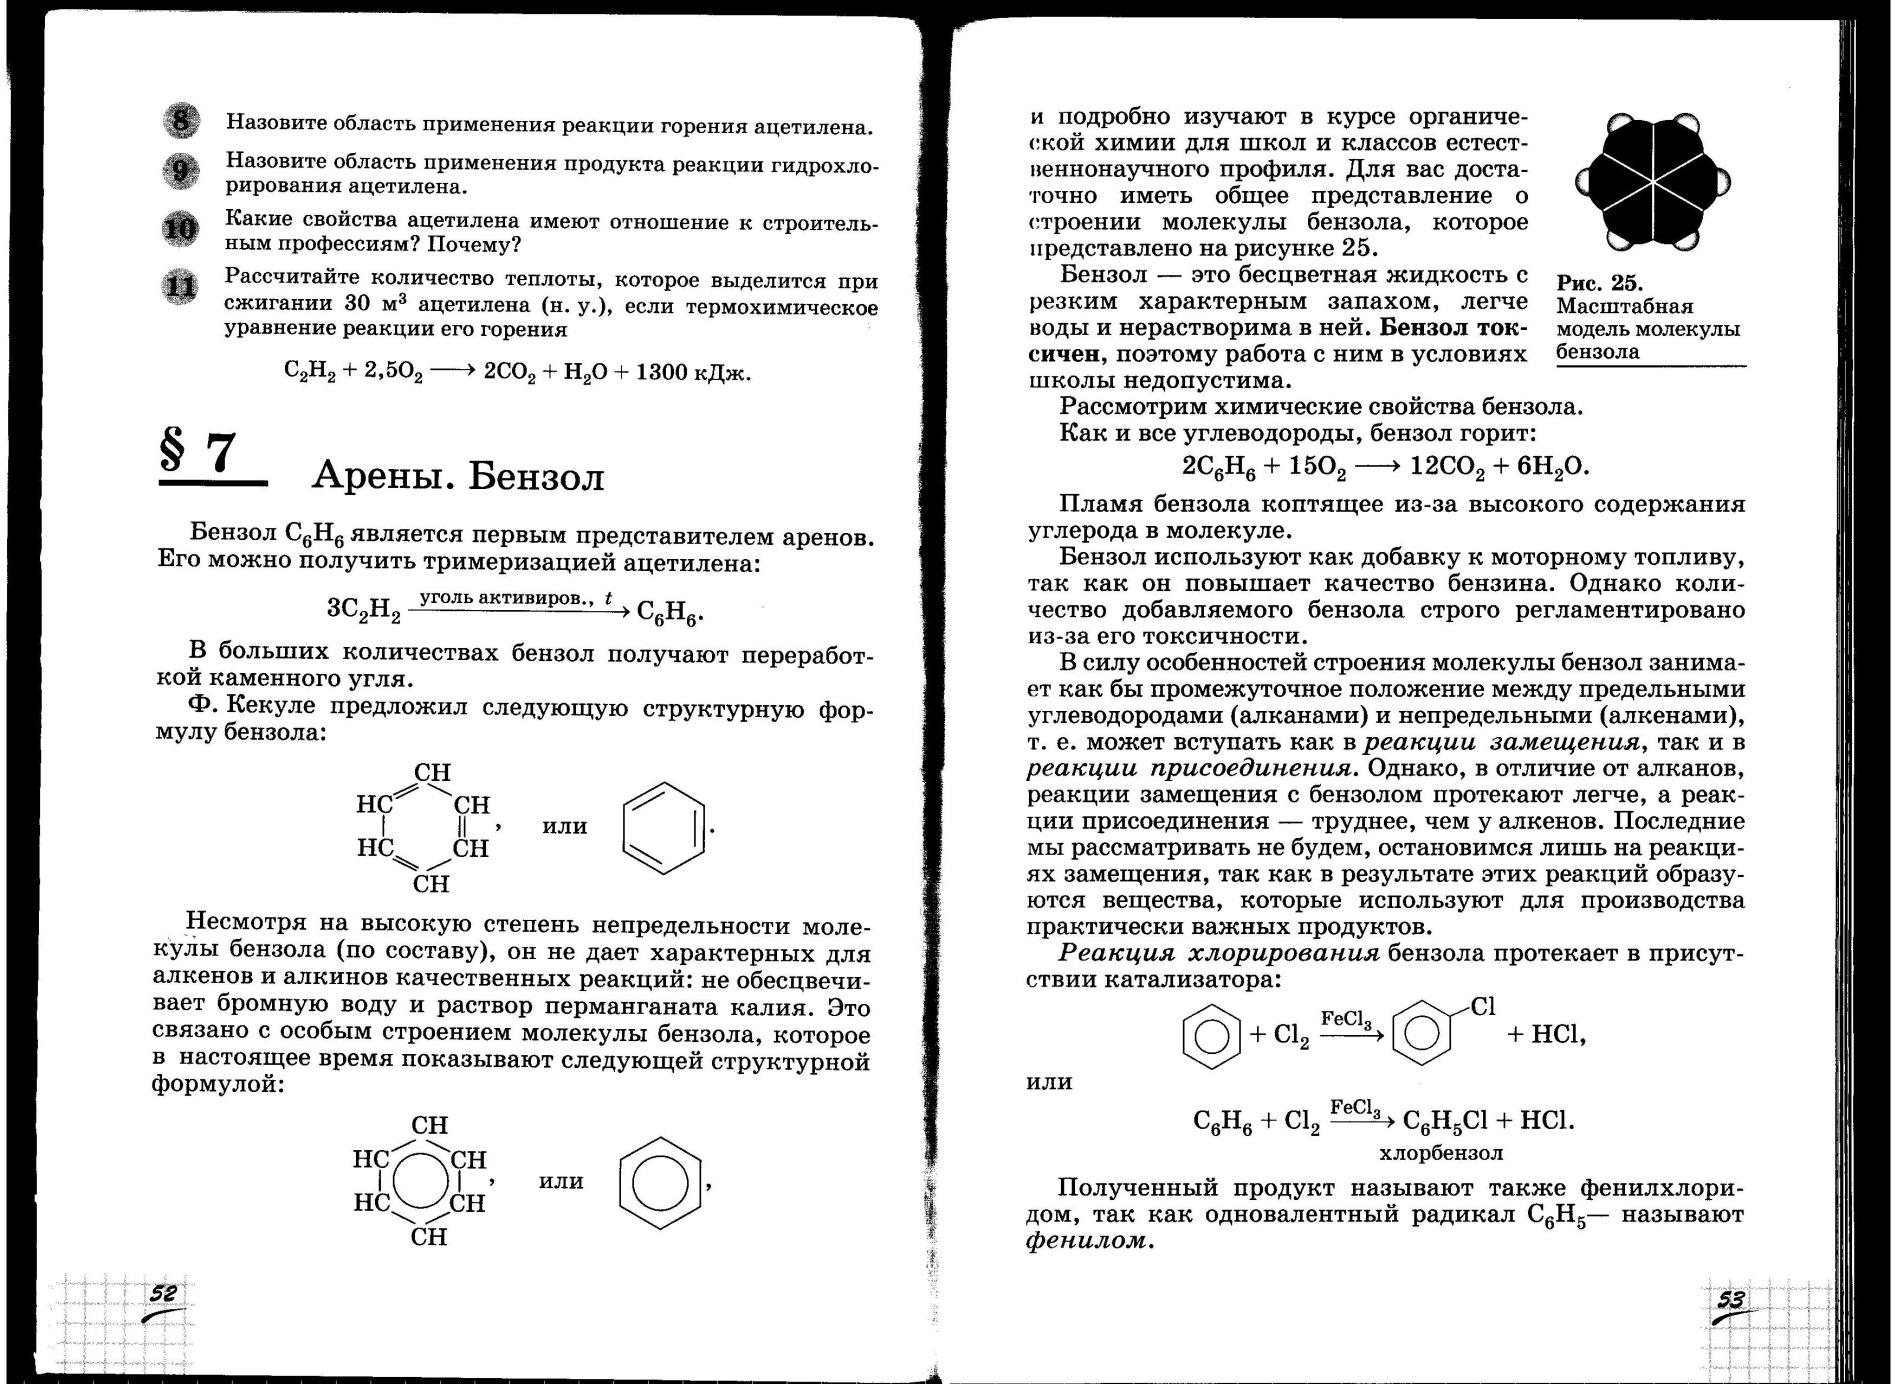 C:\Documents and Settings\Vfvf\Рабочий стол\4.jpg